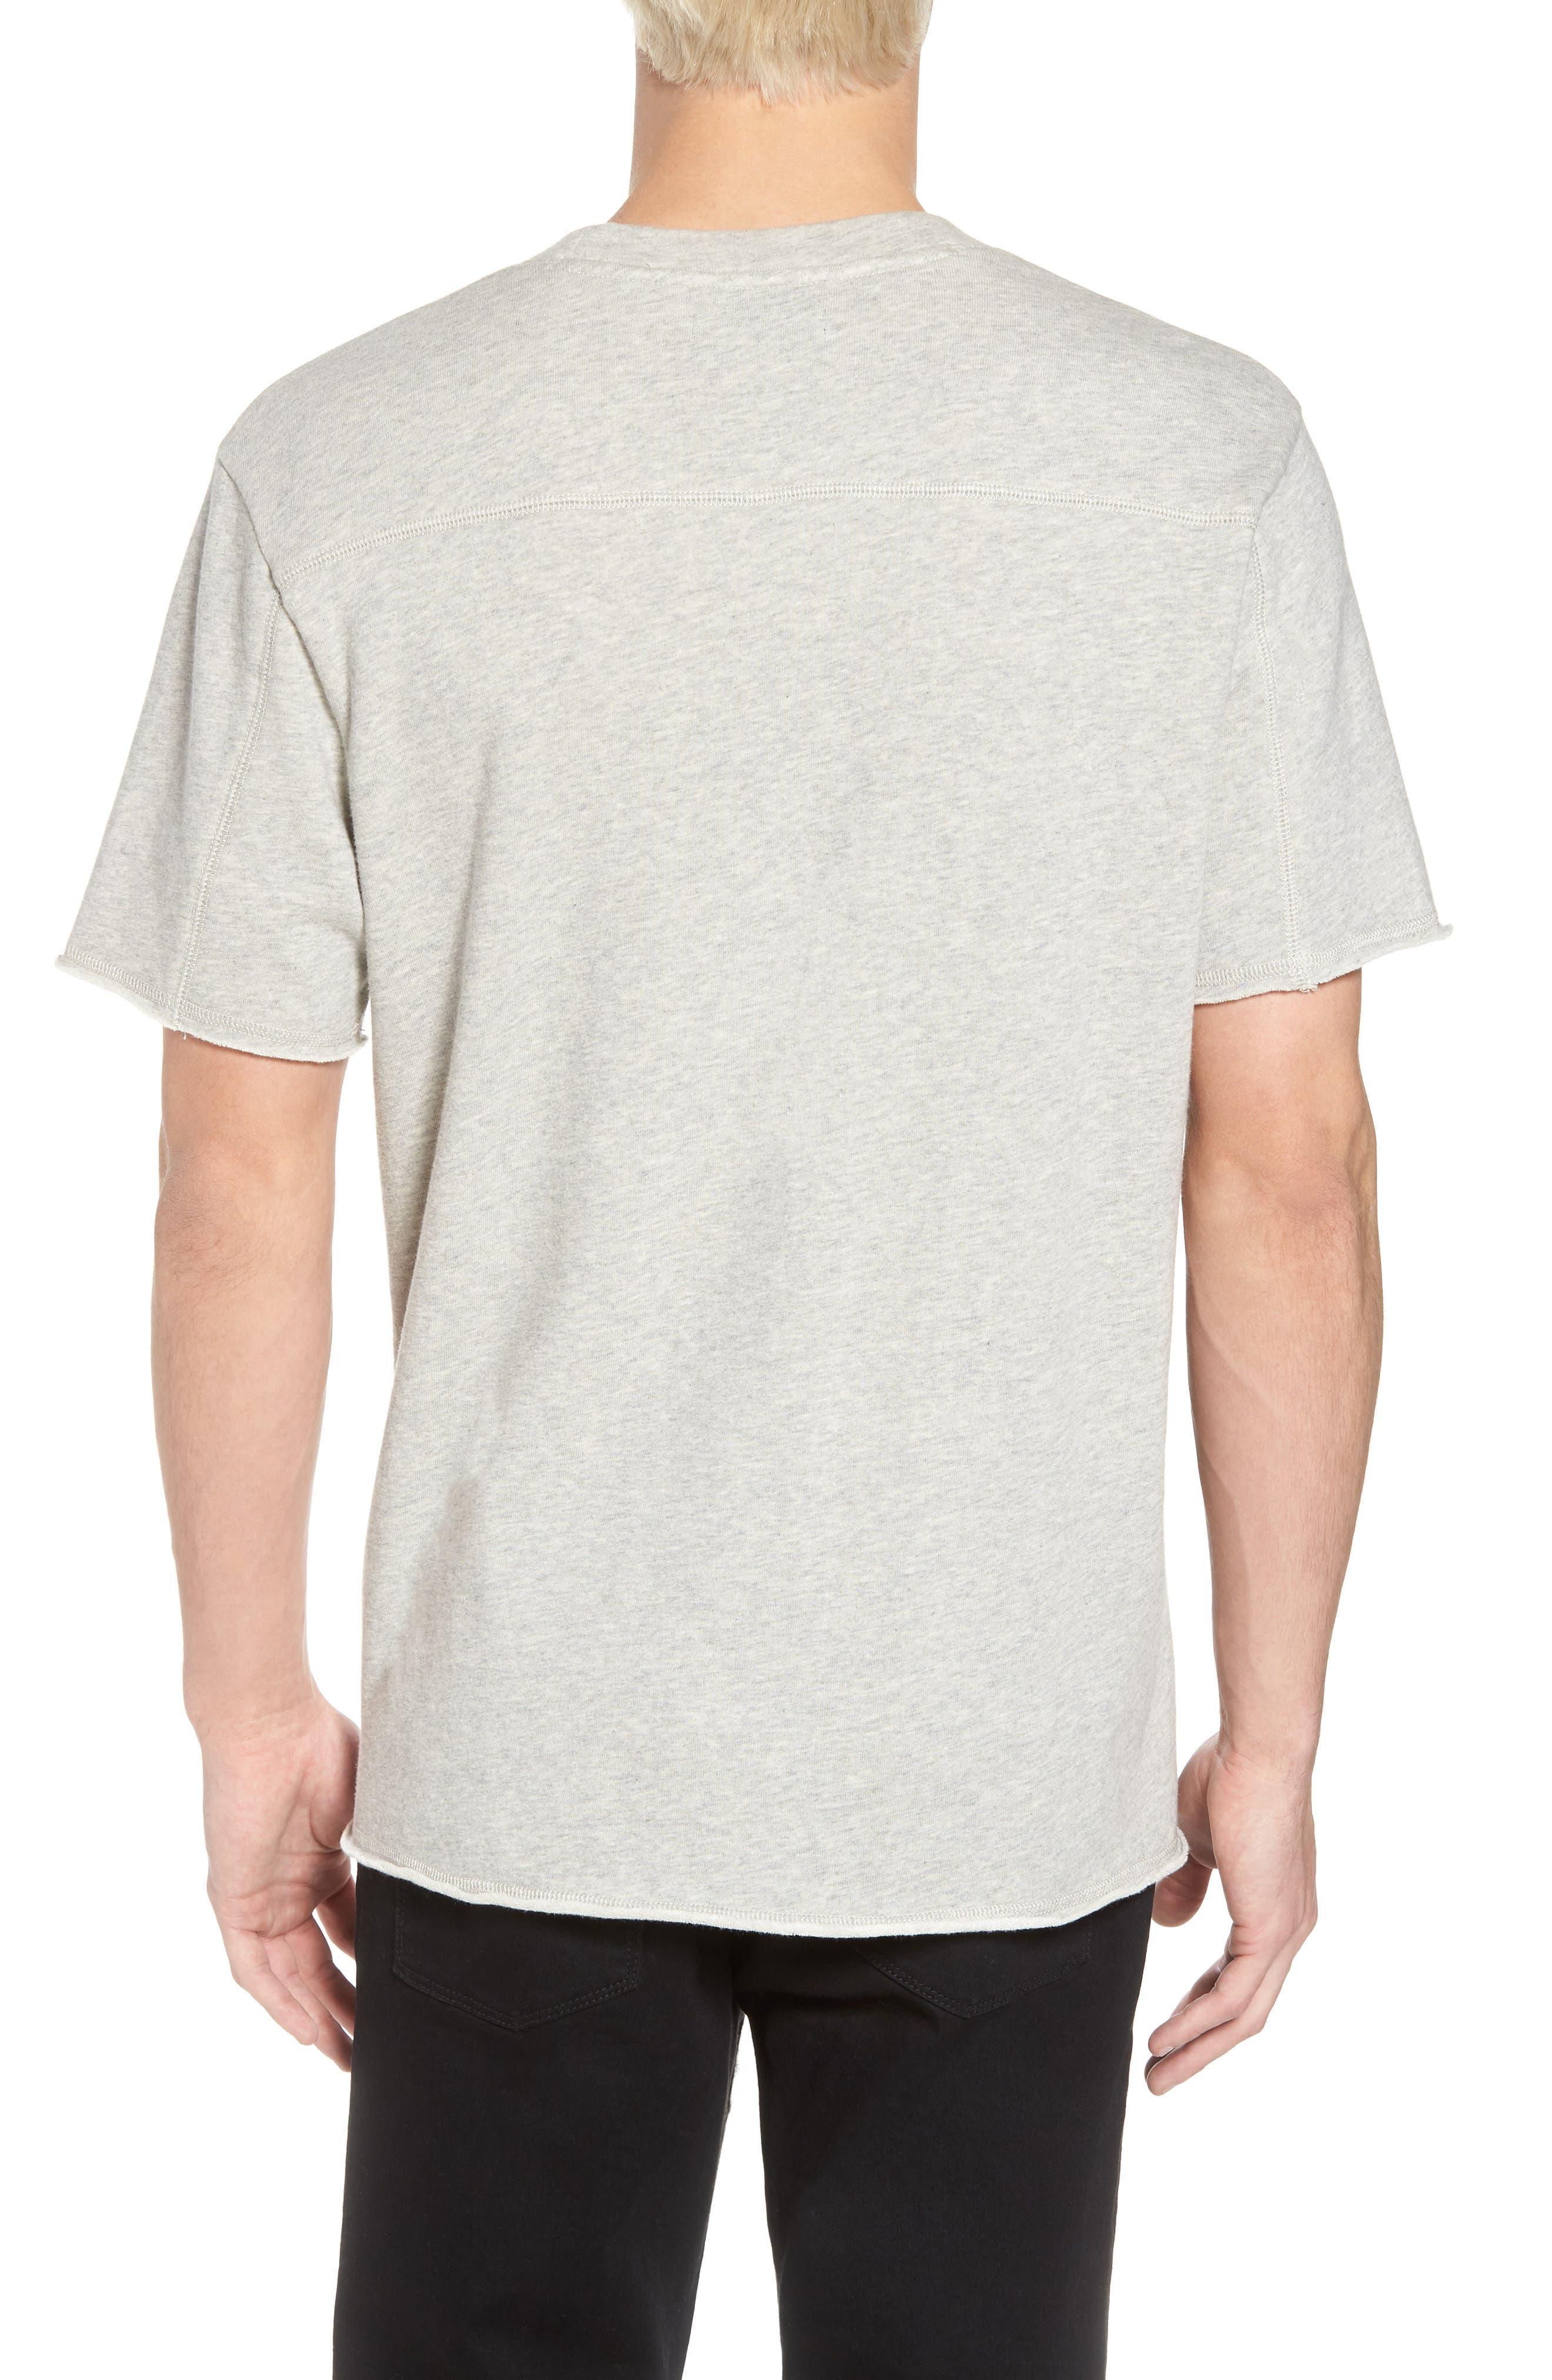 Towel T-Shirt,                             Alternate thumbnail 2, color,                             050